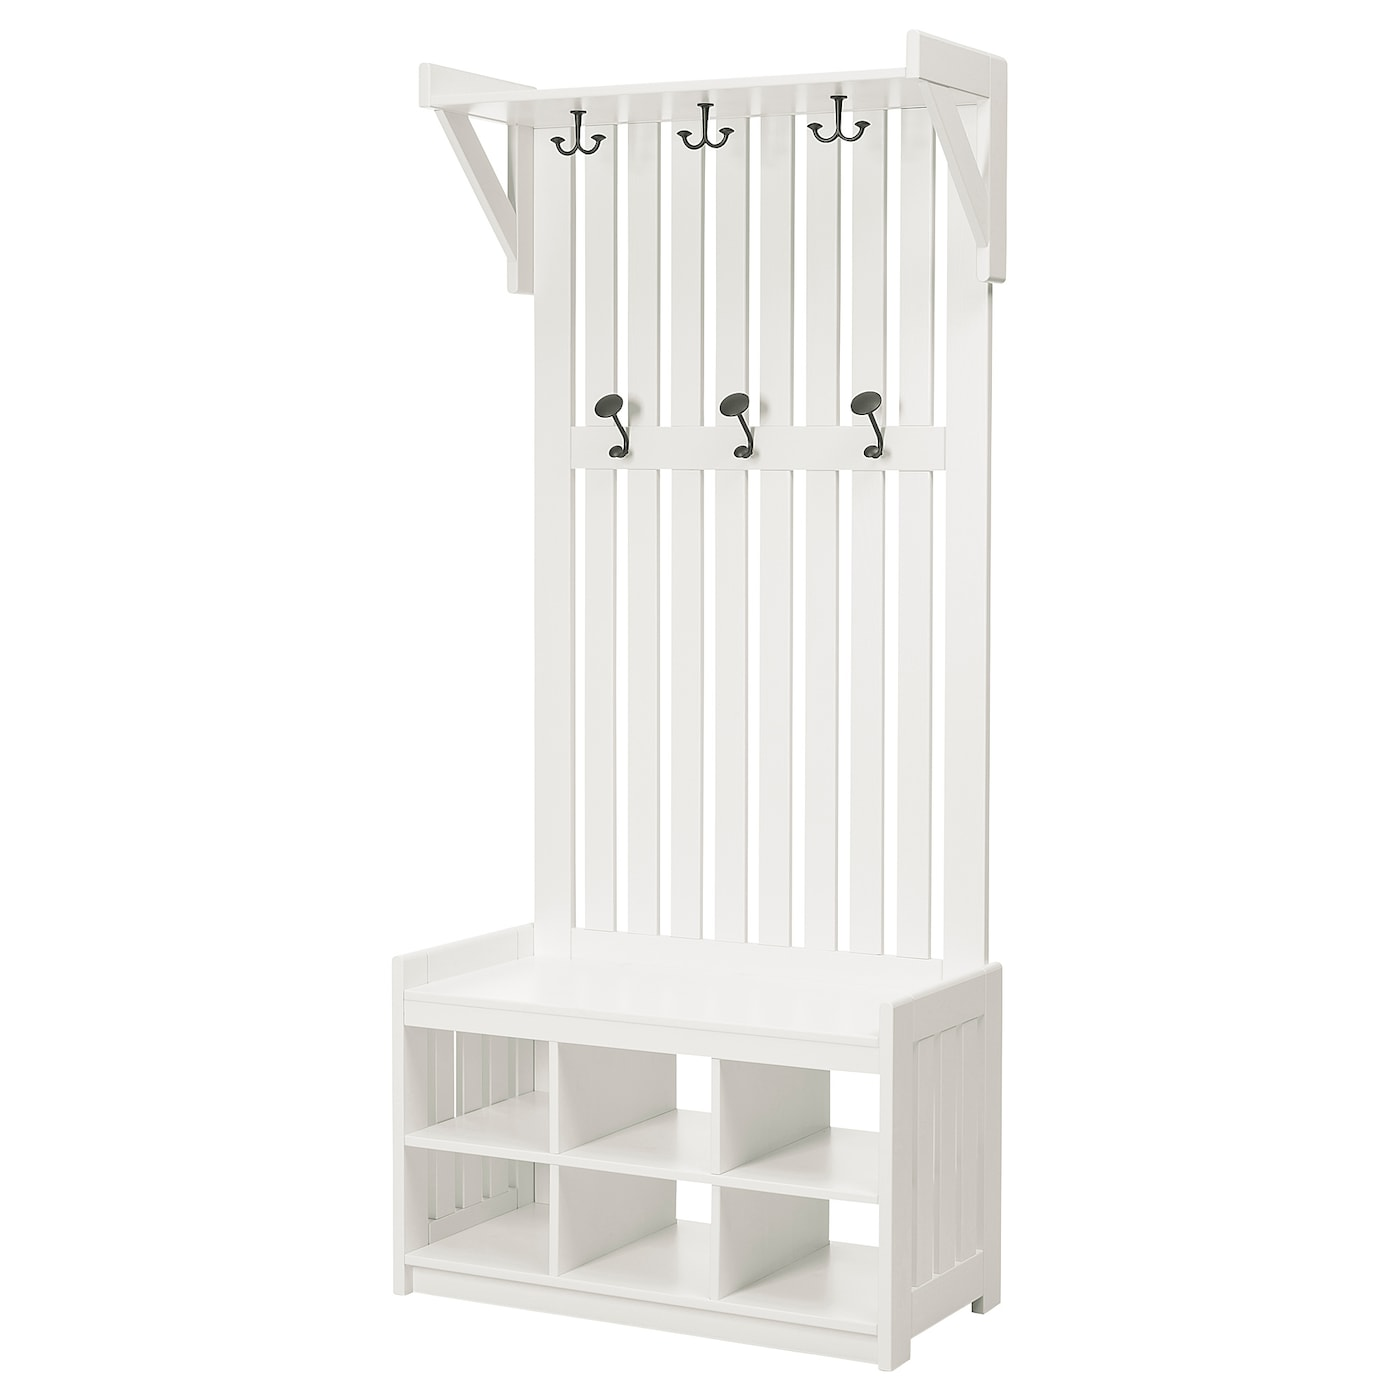 PANGET Coat rack with shoe storage bench, white, 331/2x161/8x783/4